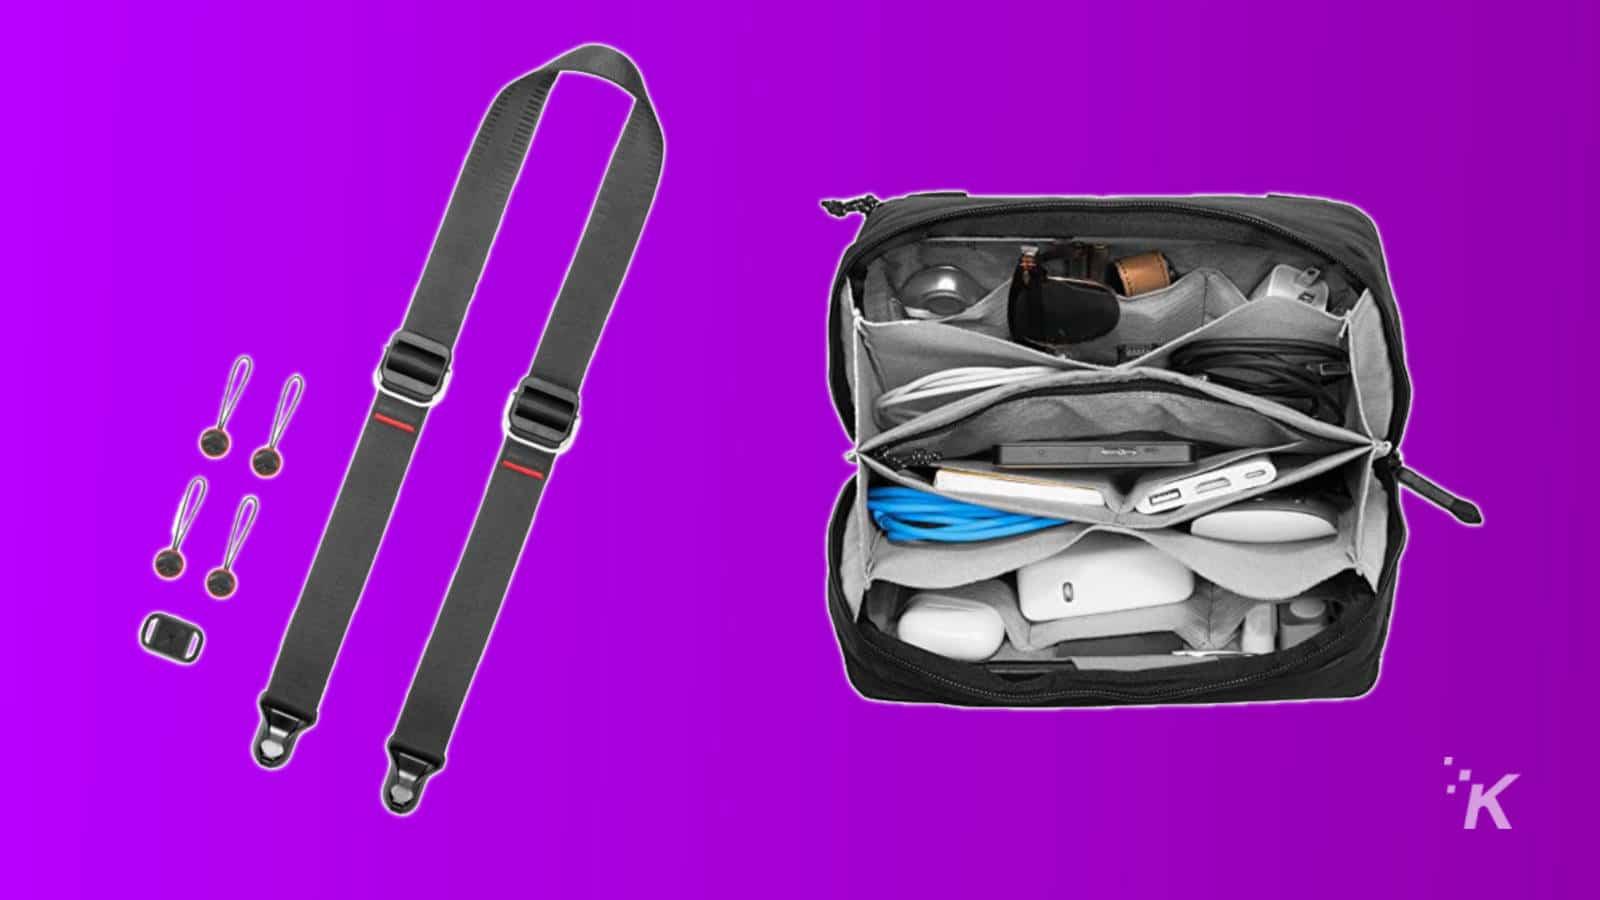 peak design slide lite strap and tech pouch father's day